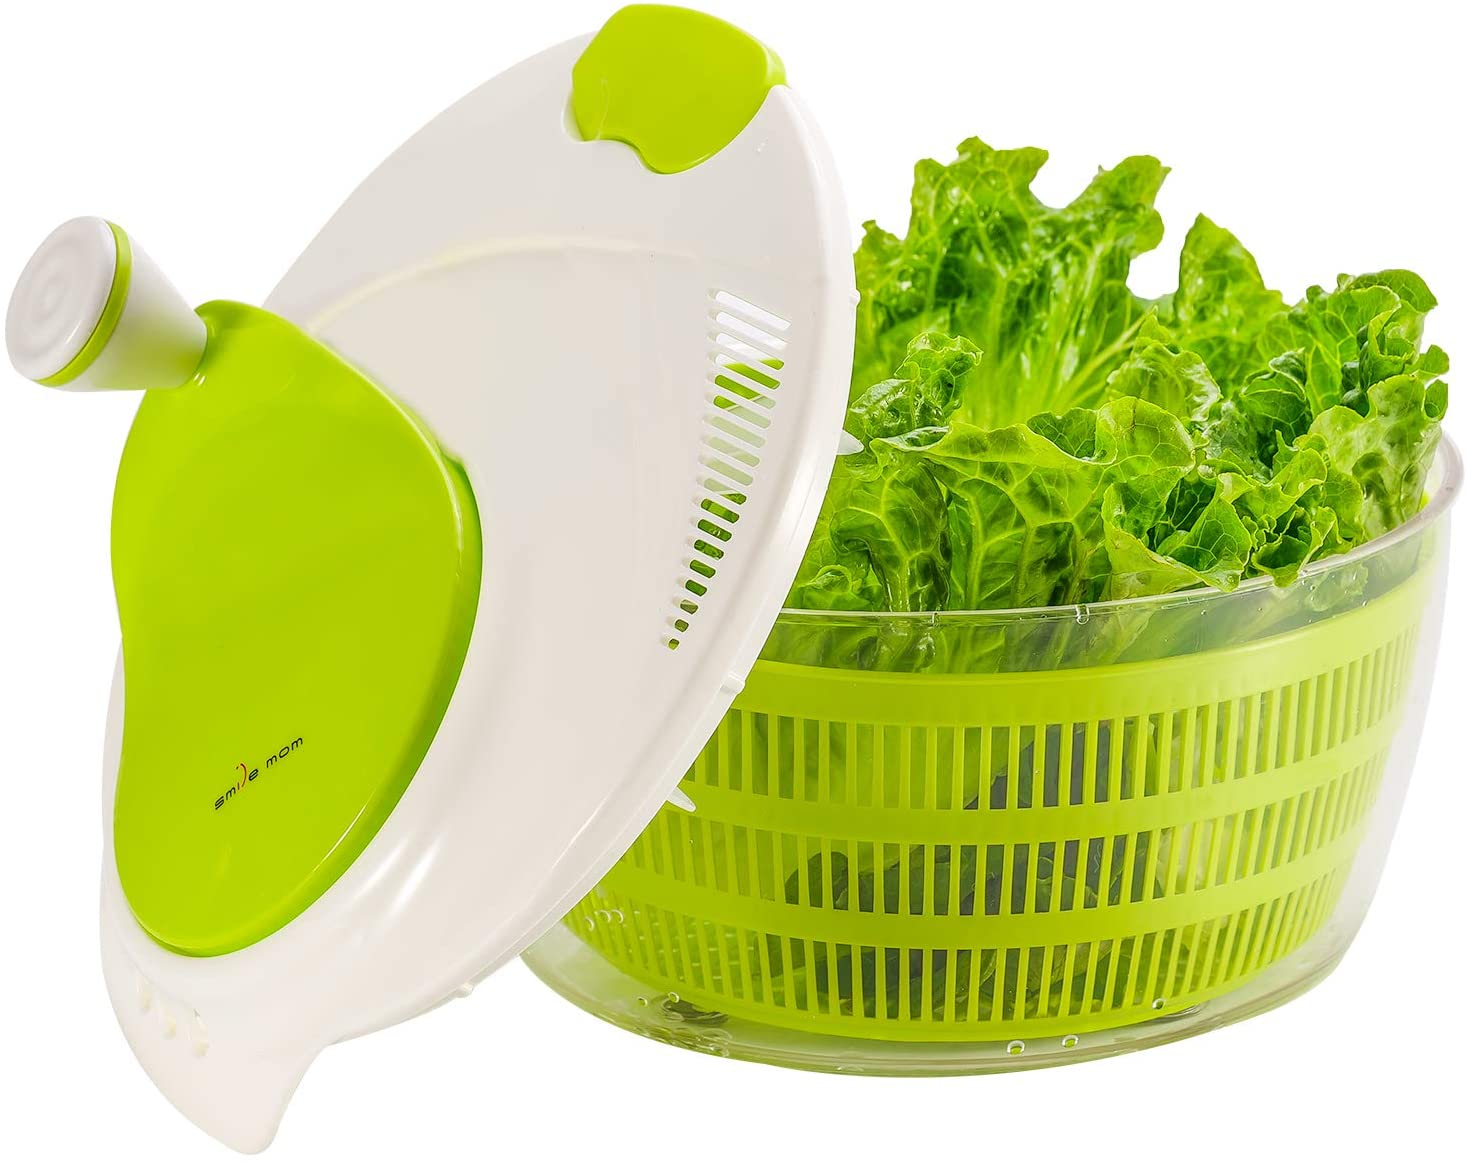 Smile Mom Salad Spinner Large 4 Quarts, ABS,BPA Free Clips & Locking, Lettuce Vegetables Washer Dryer Drainer Crisper Strainer for Home Kitchen Washing & Drying Leafy Vegetables